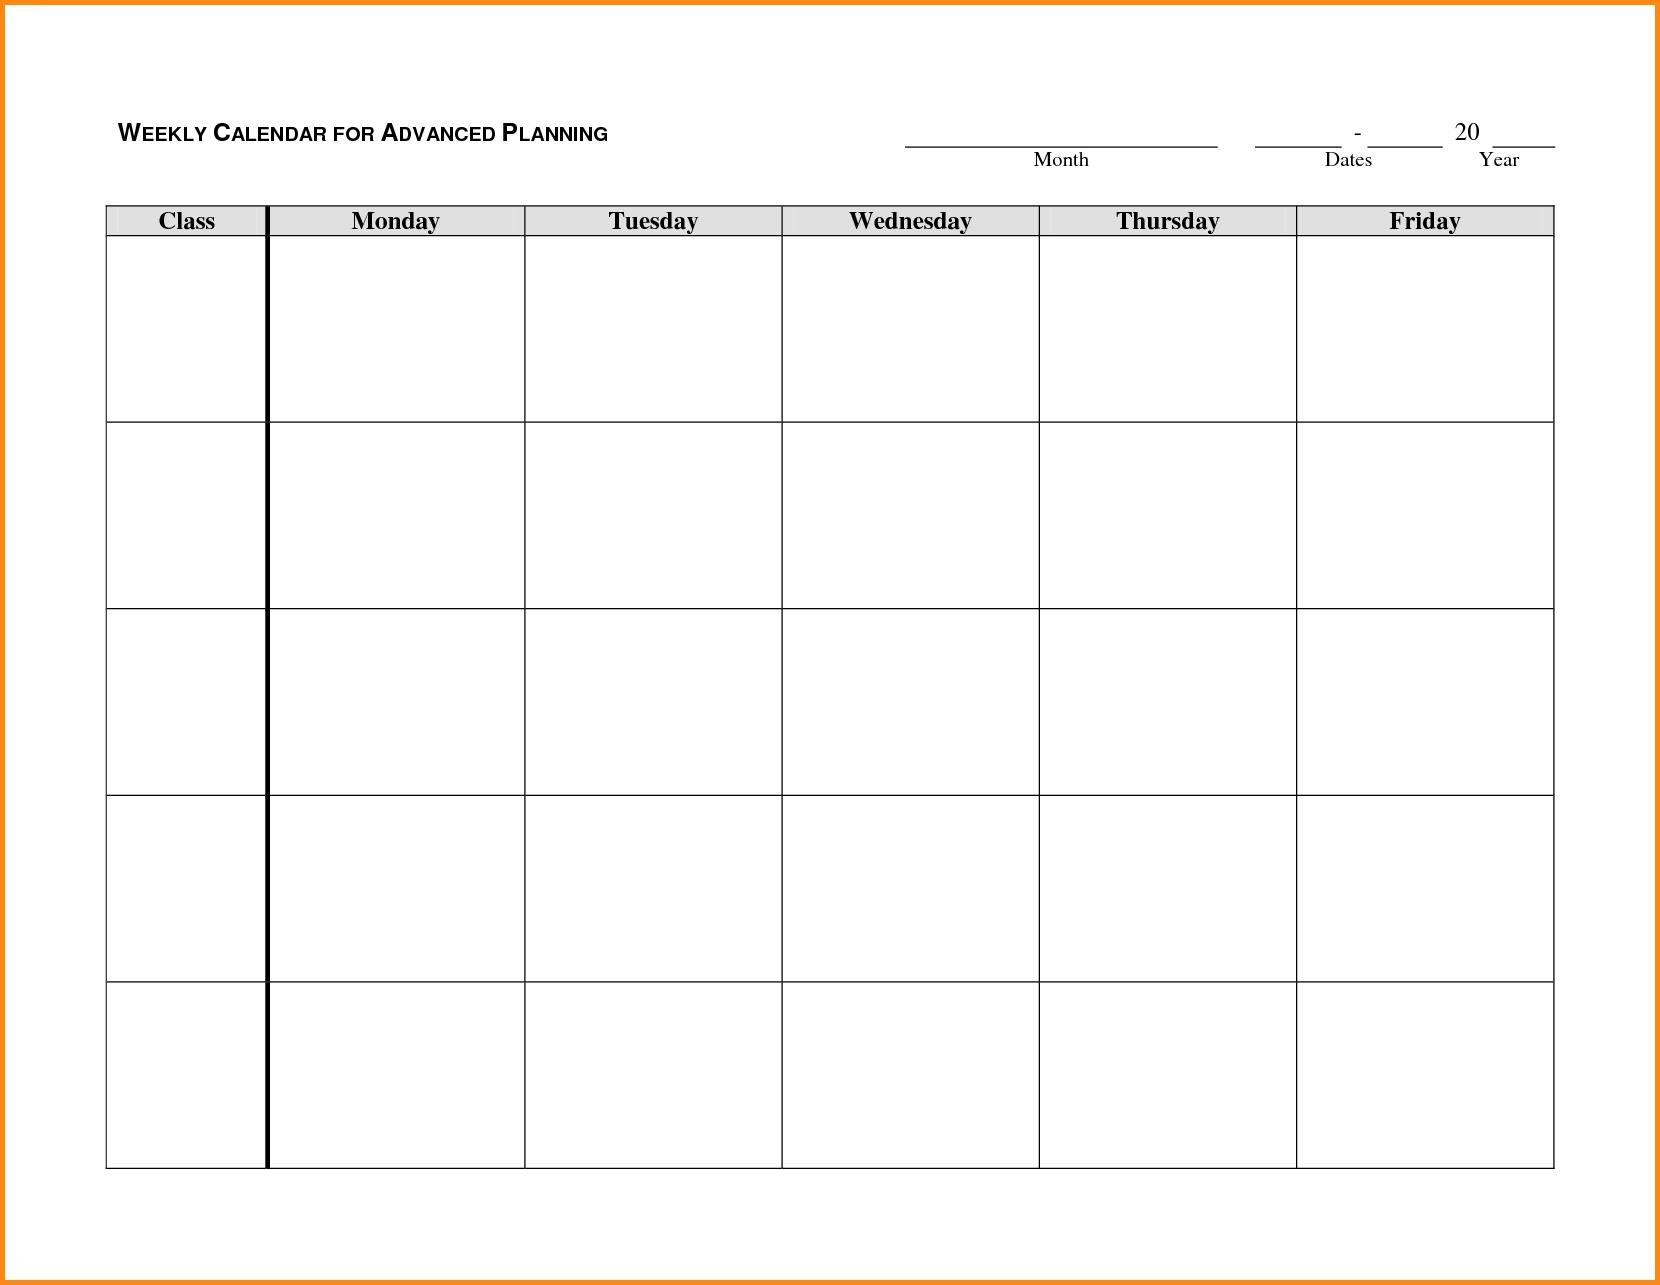 Blank Calendar Monday Through Friday Printable Online Calendar3abry